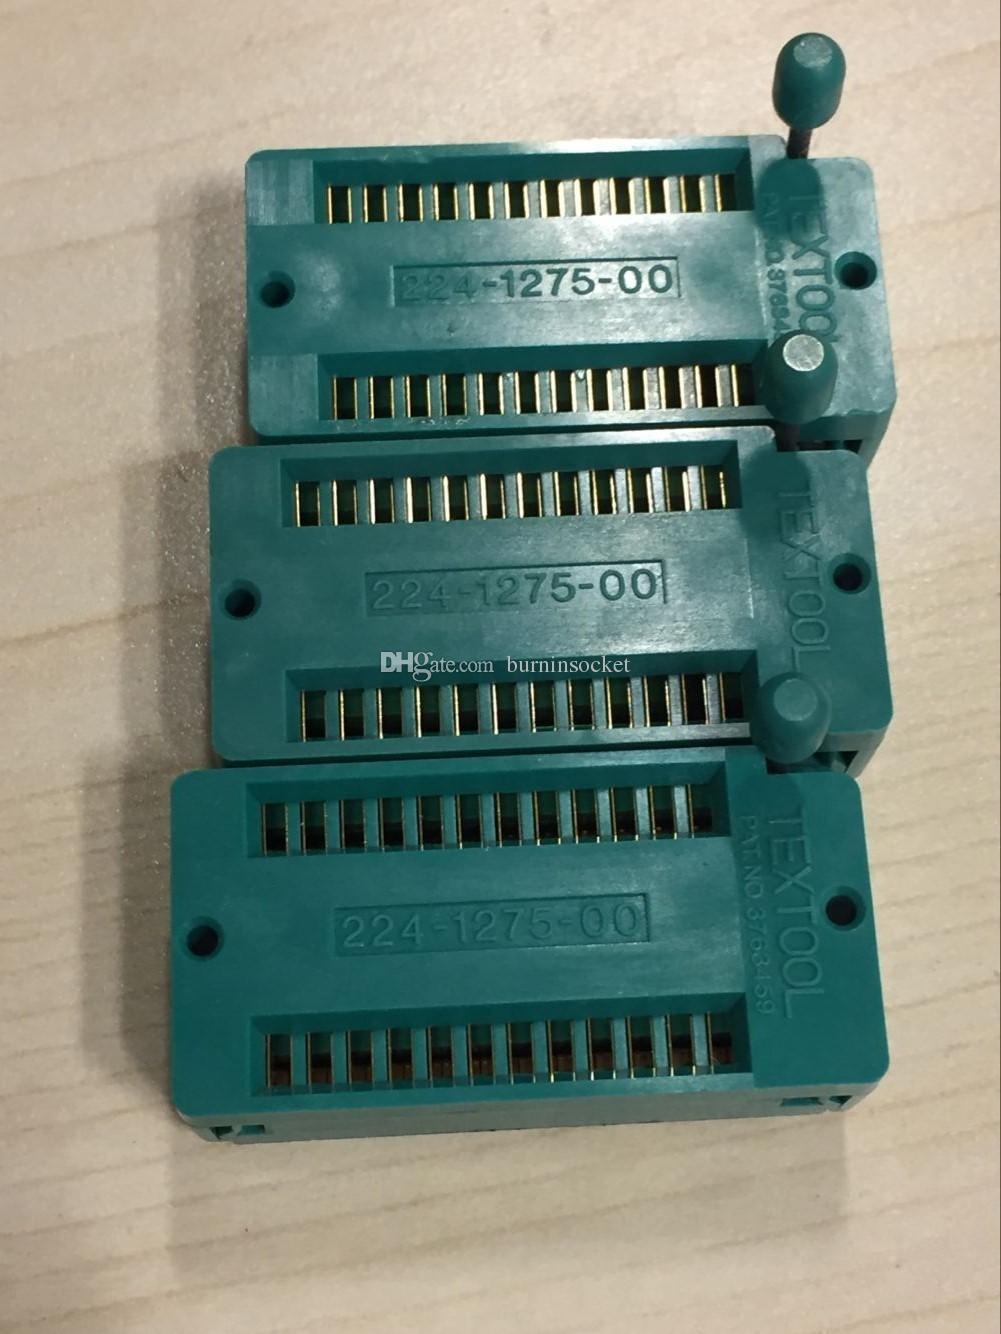 3 M TEXTOOL 224-1275-00-0602J DIP24PIN 2.54 MM PITCH ZIP SOKET